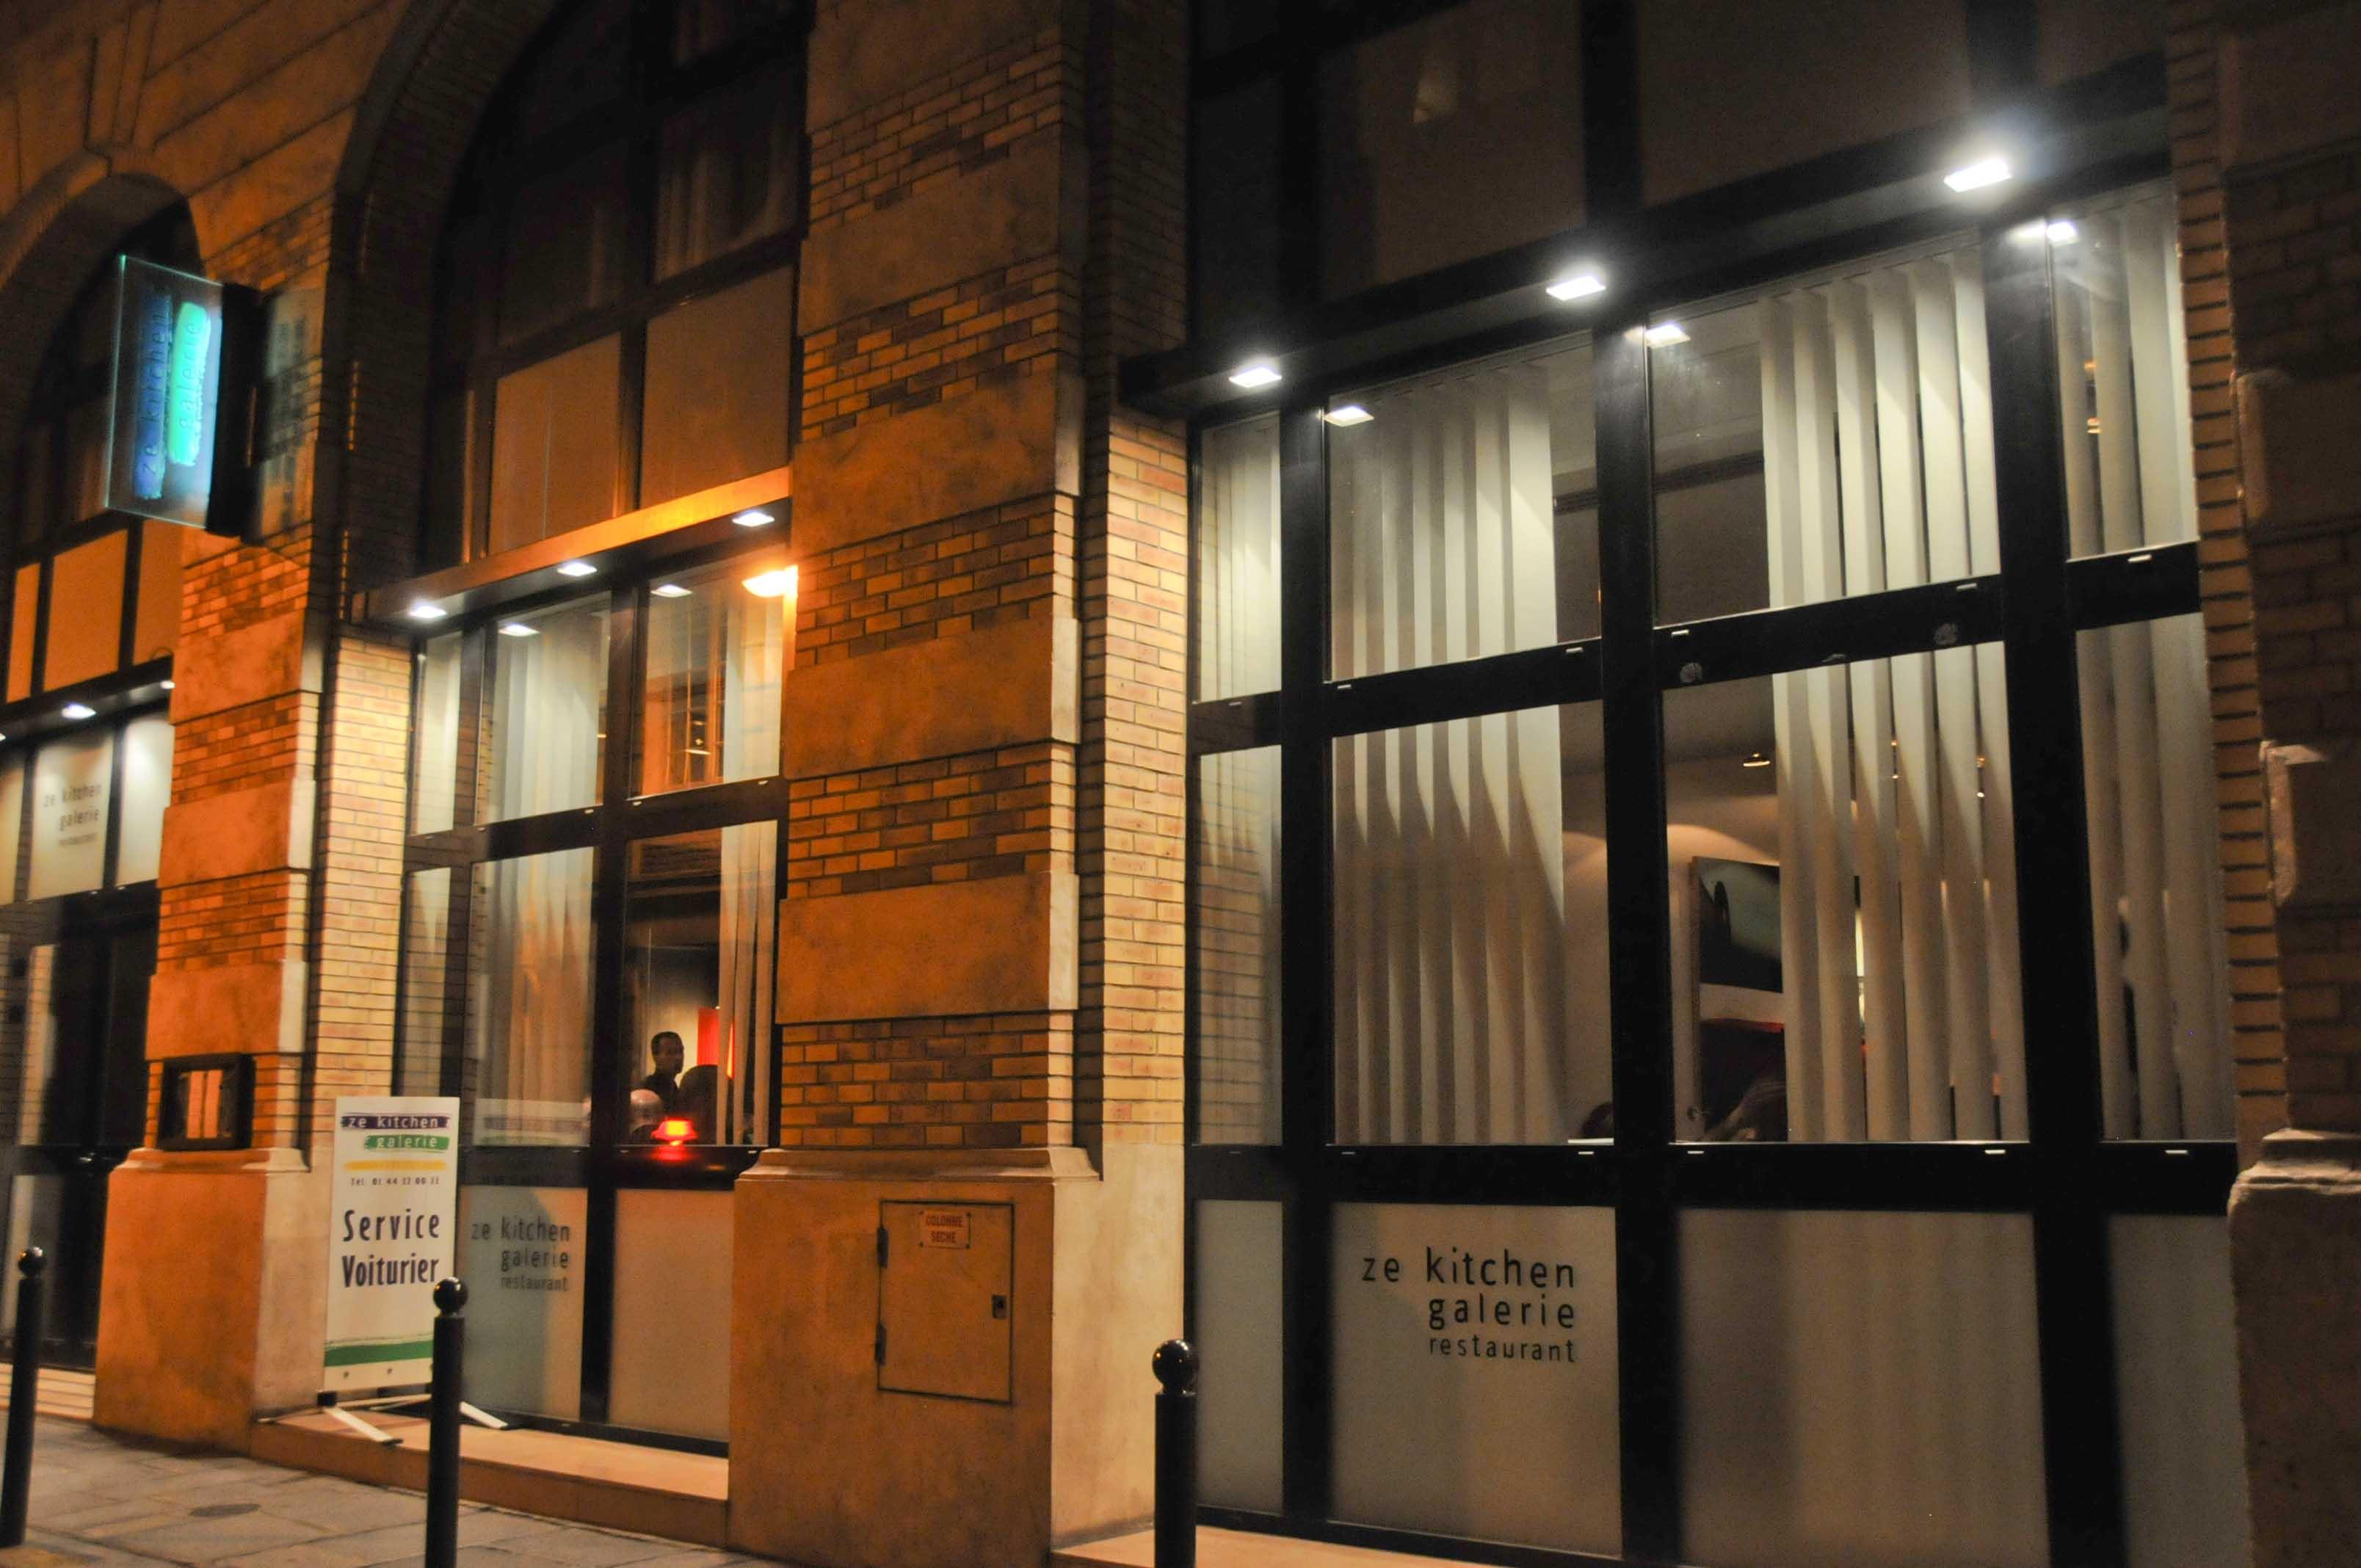 Ze kitchen galerie restaurant de william ledeuil paris for Ze kitchen galerie paris france